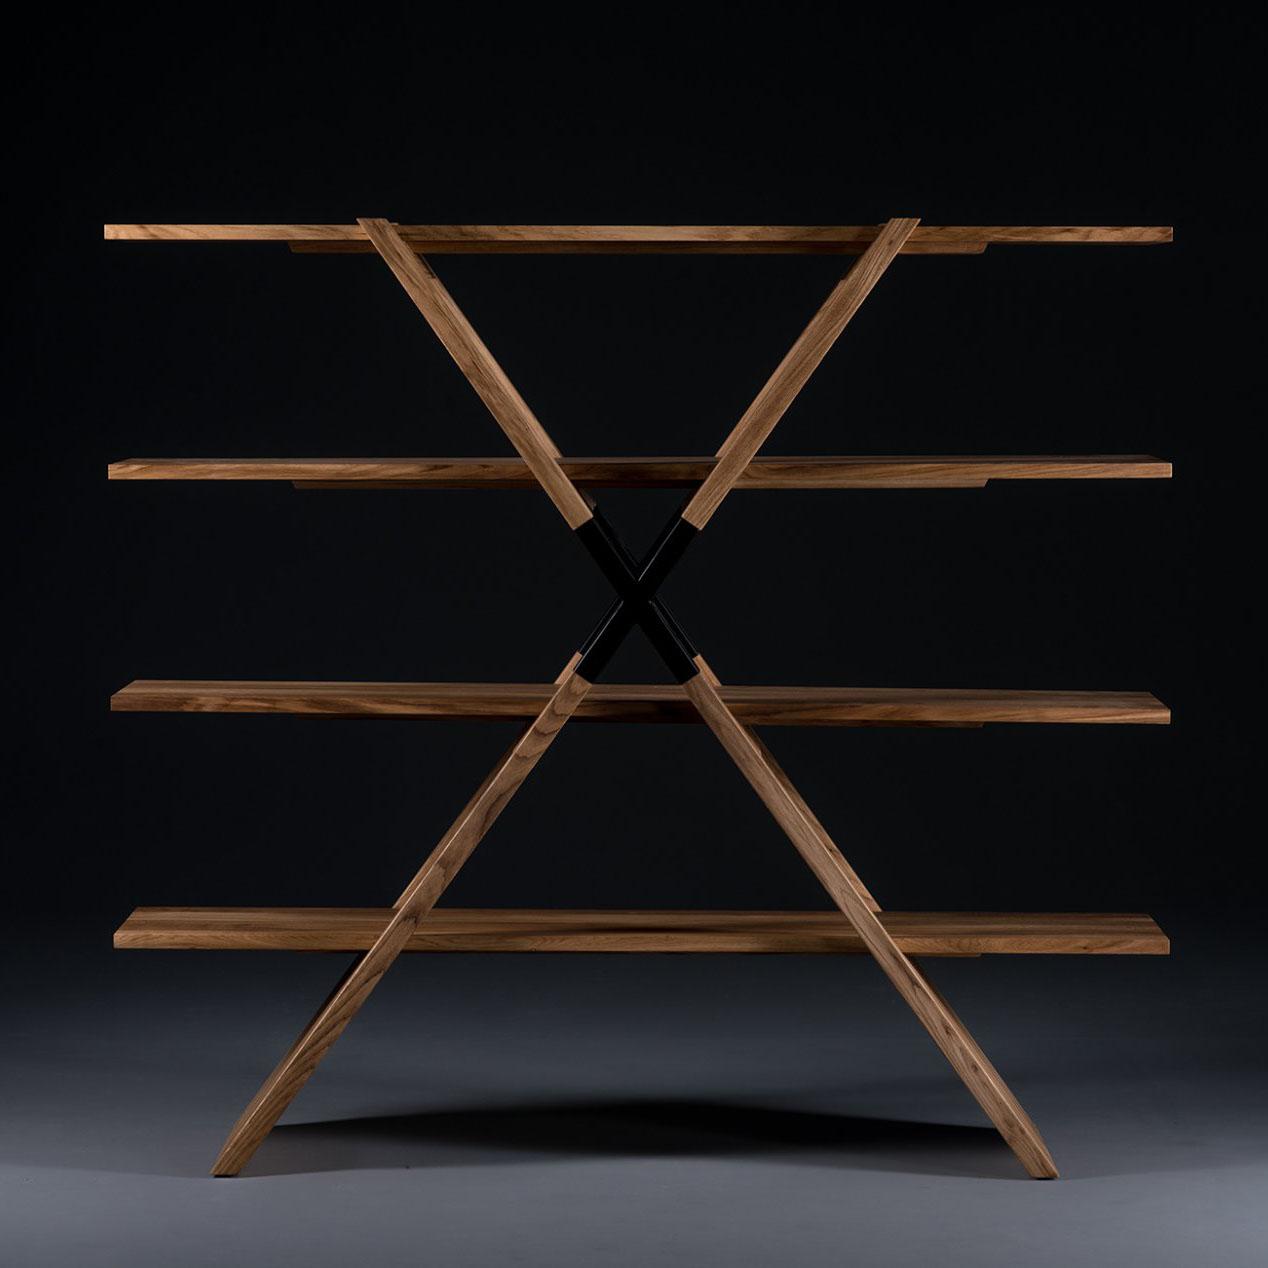 Mueble Modular X Shelf, diseño en madera, moderno y artesanal